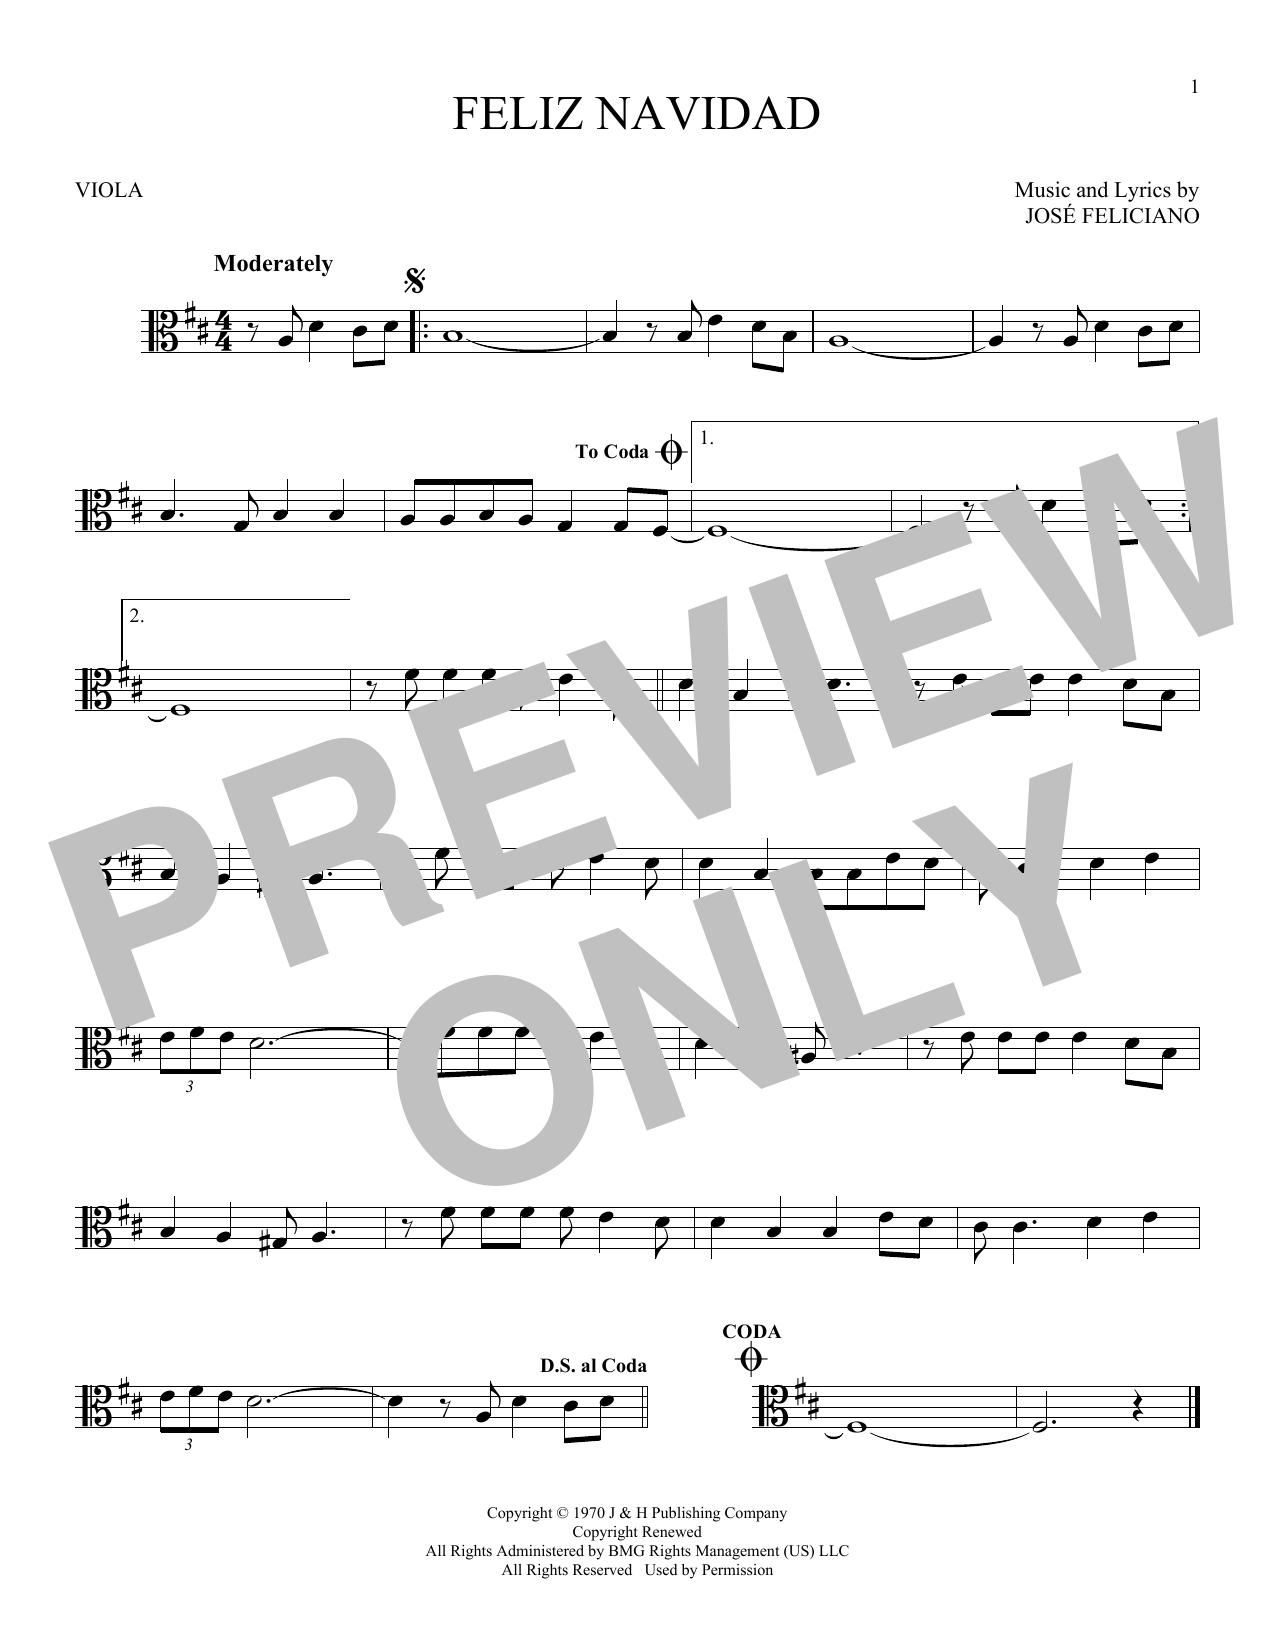 Sheet Music Digital Files To Print Licensed Jose Feliciano Digital